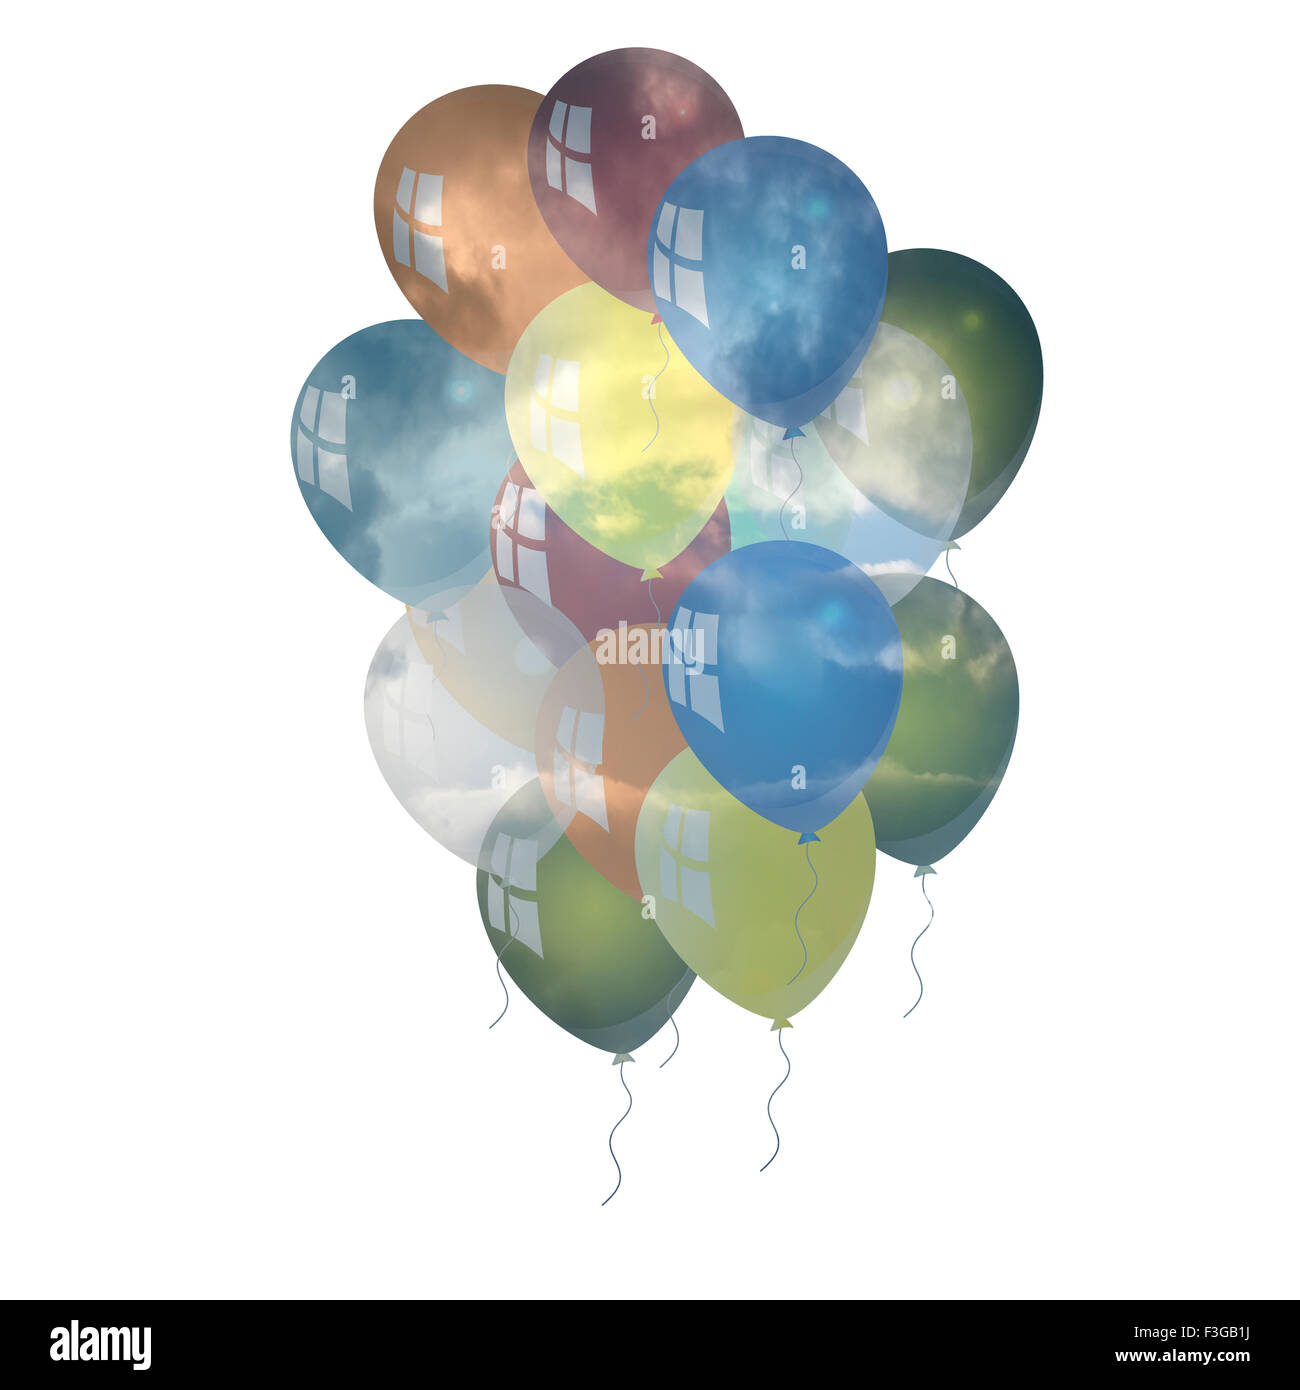 Balloon, Celebration, Group, Event, Festival, Colour, Fun, Party ...